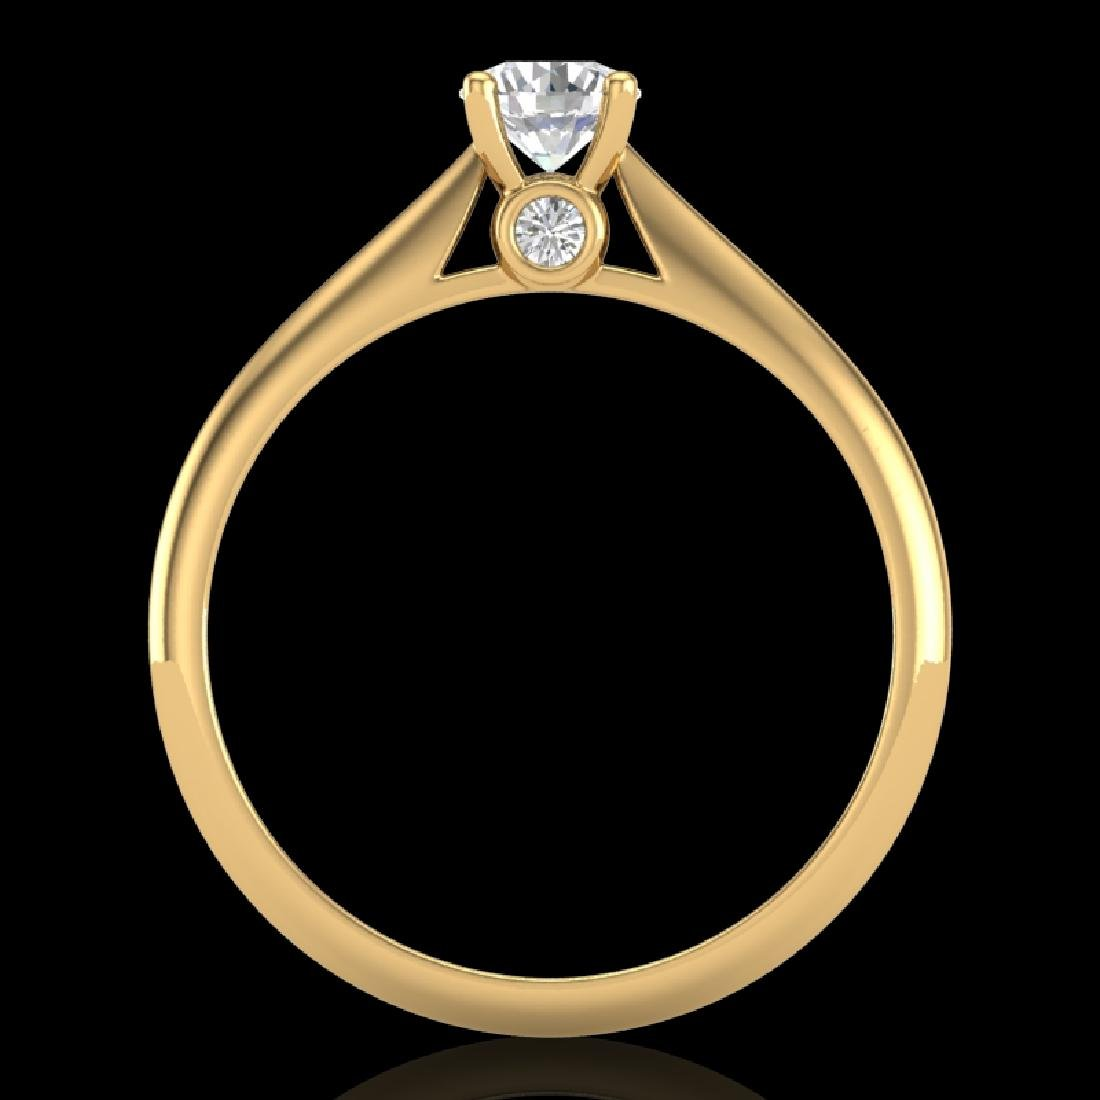 0.4 CTW VS/SI Diamond Solitaire Art Deco Ring 18K - 2